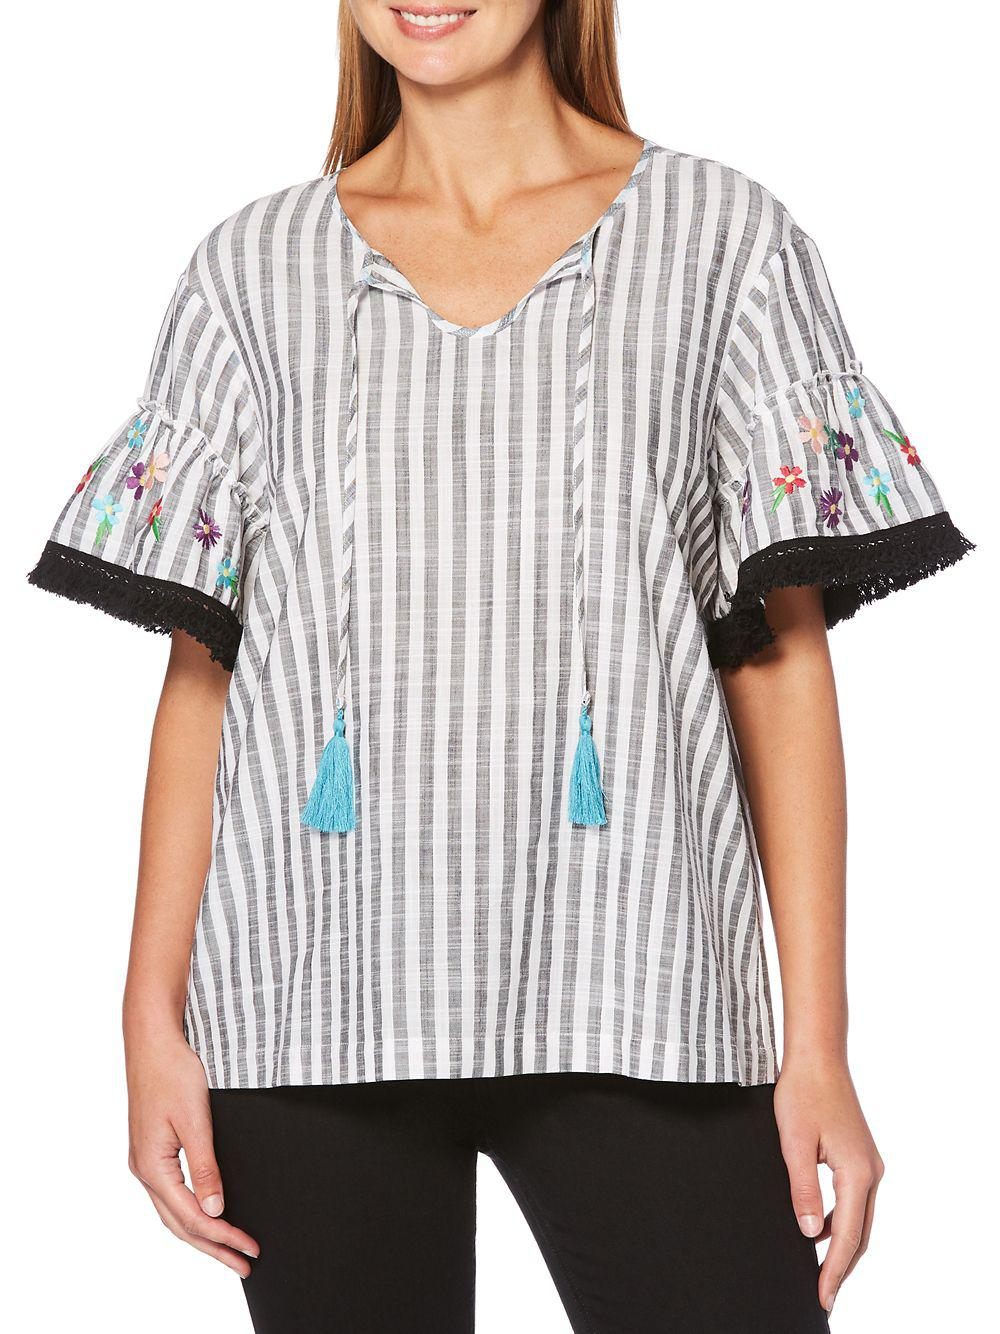 a05b852b7c7d6 Lyst - Rafaella Embroidered Striped Top in Black